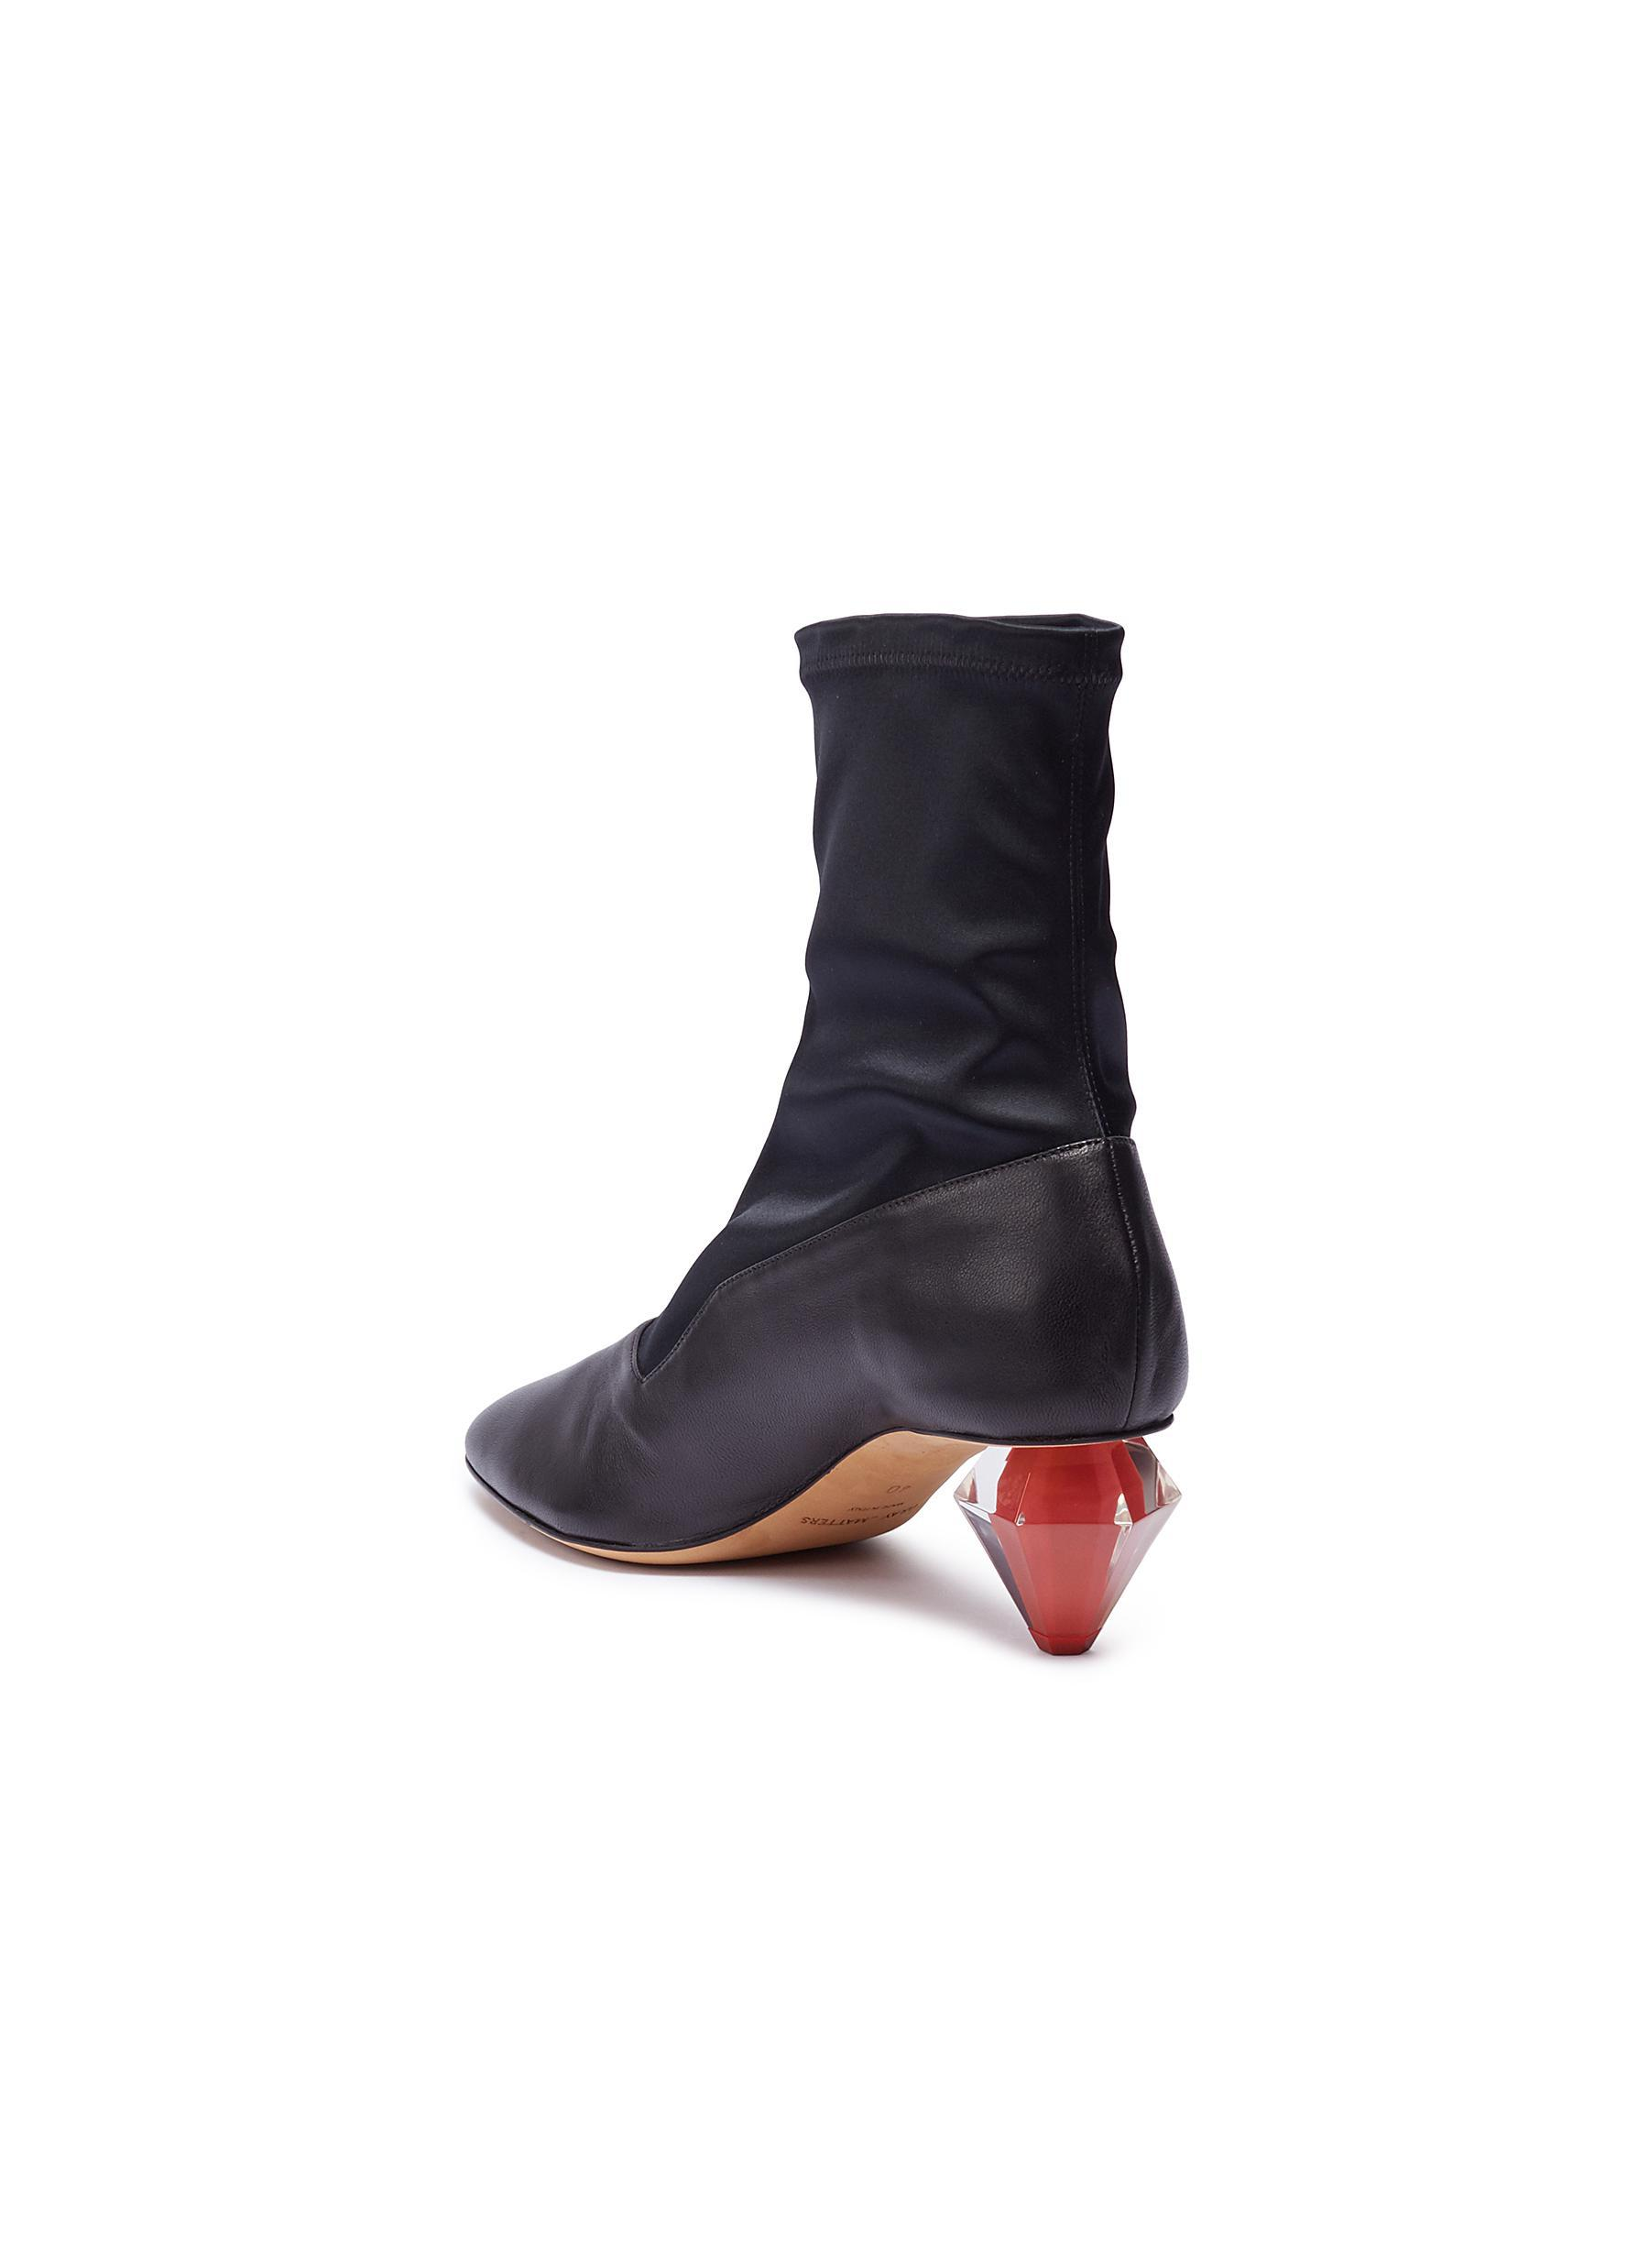 Gray Matters 'diamante' Geometric Heel Satin Panel Leather Boots in Black